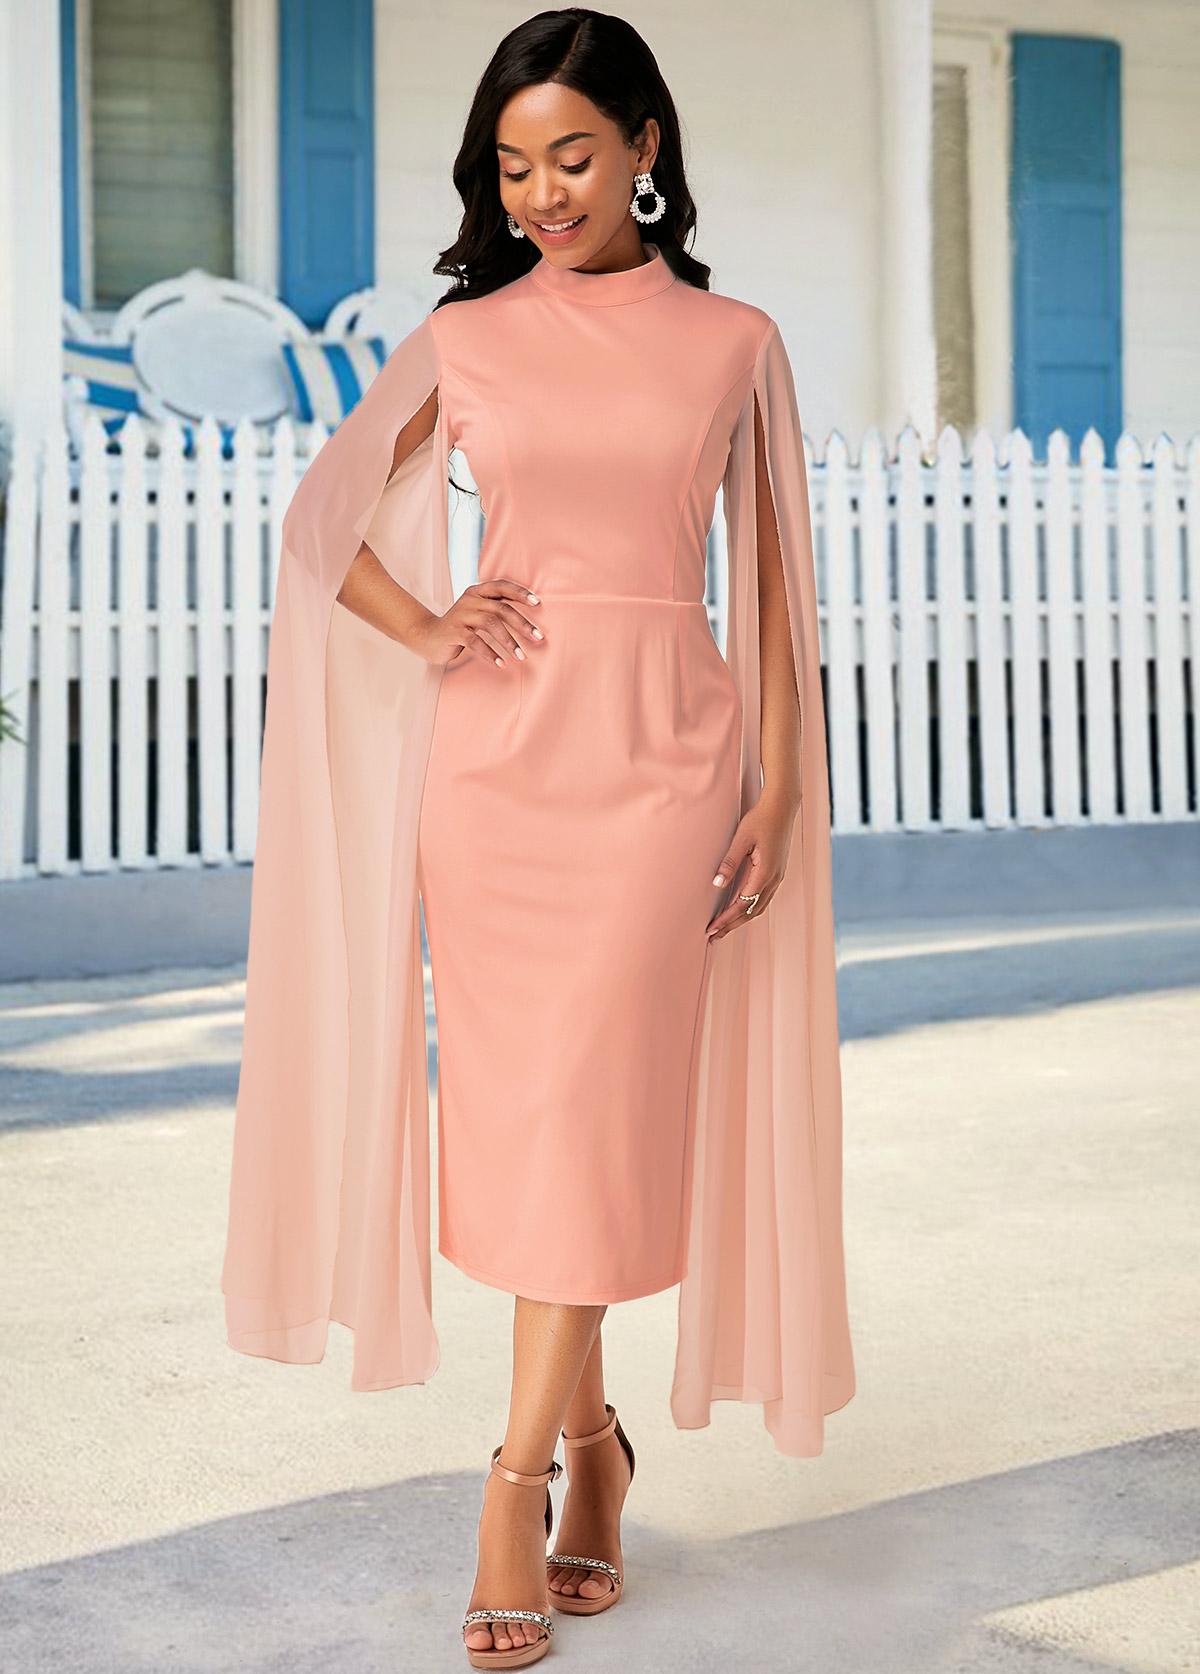 Stand Collar Pink Zipper Closure Cape Dress